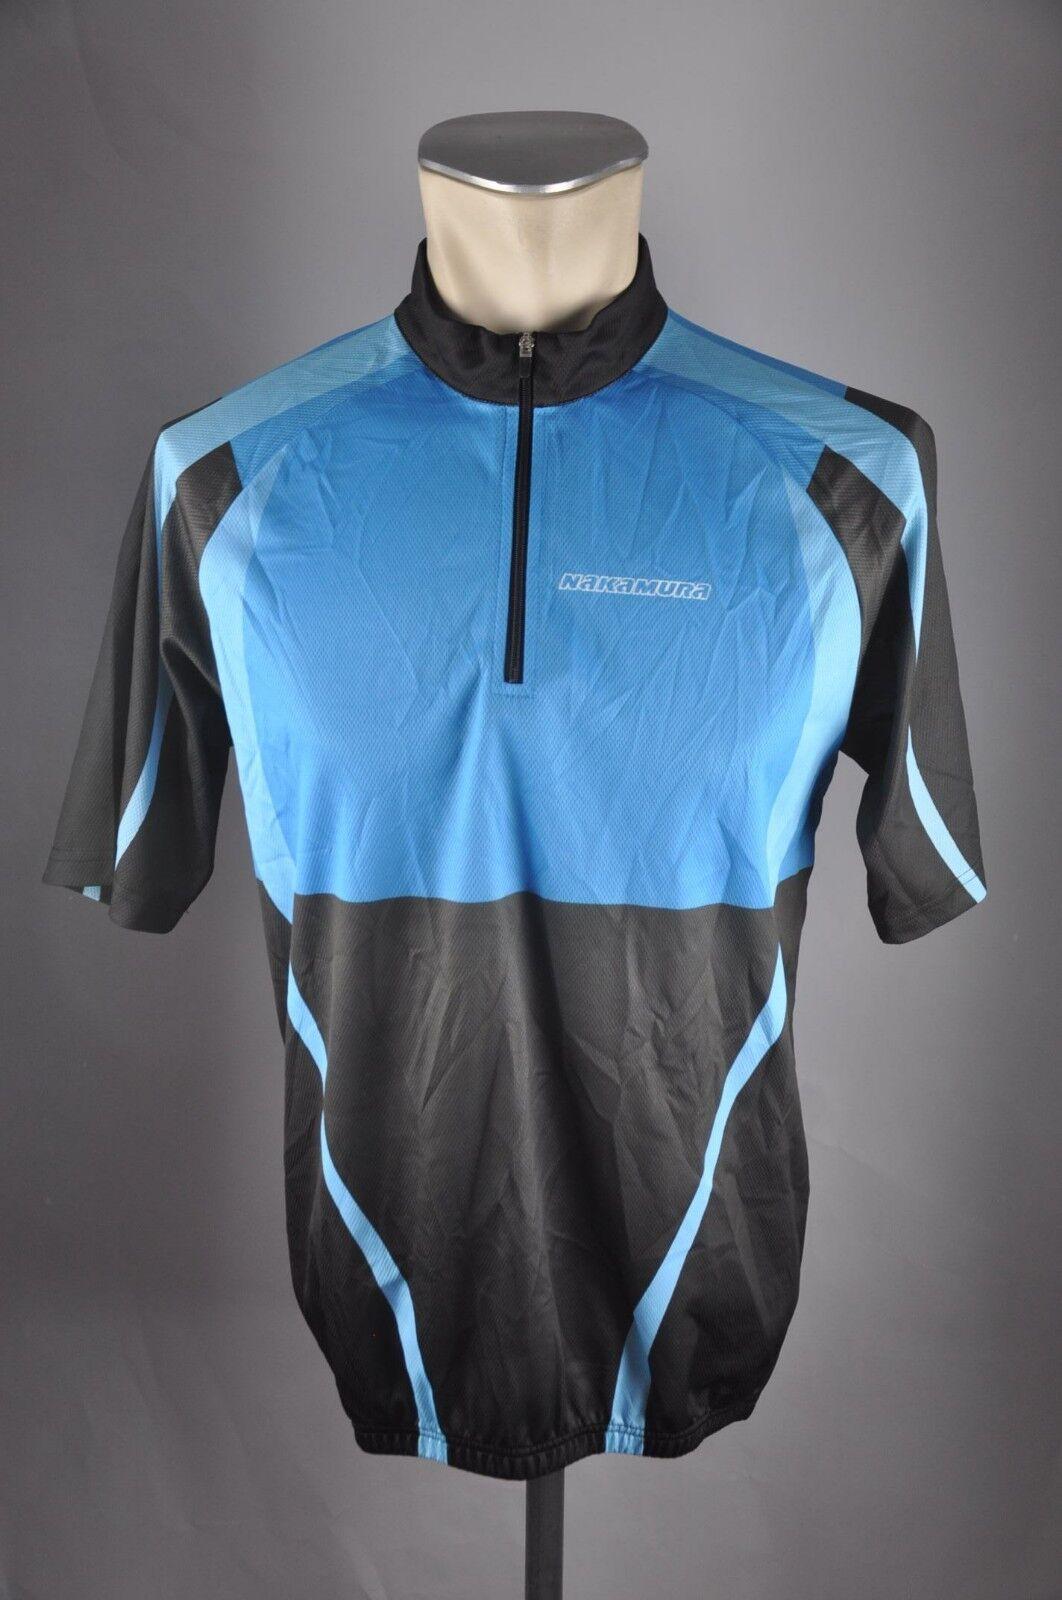 Nakamura rueda camiseta camiseta camiseta radtrikot talla L 53cm bike Cycling Jersey camisa d3 eb32bf